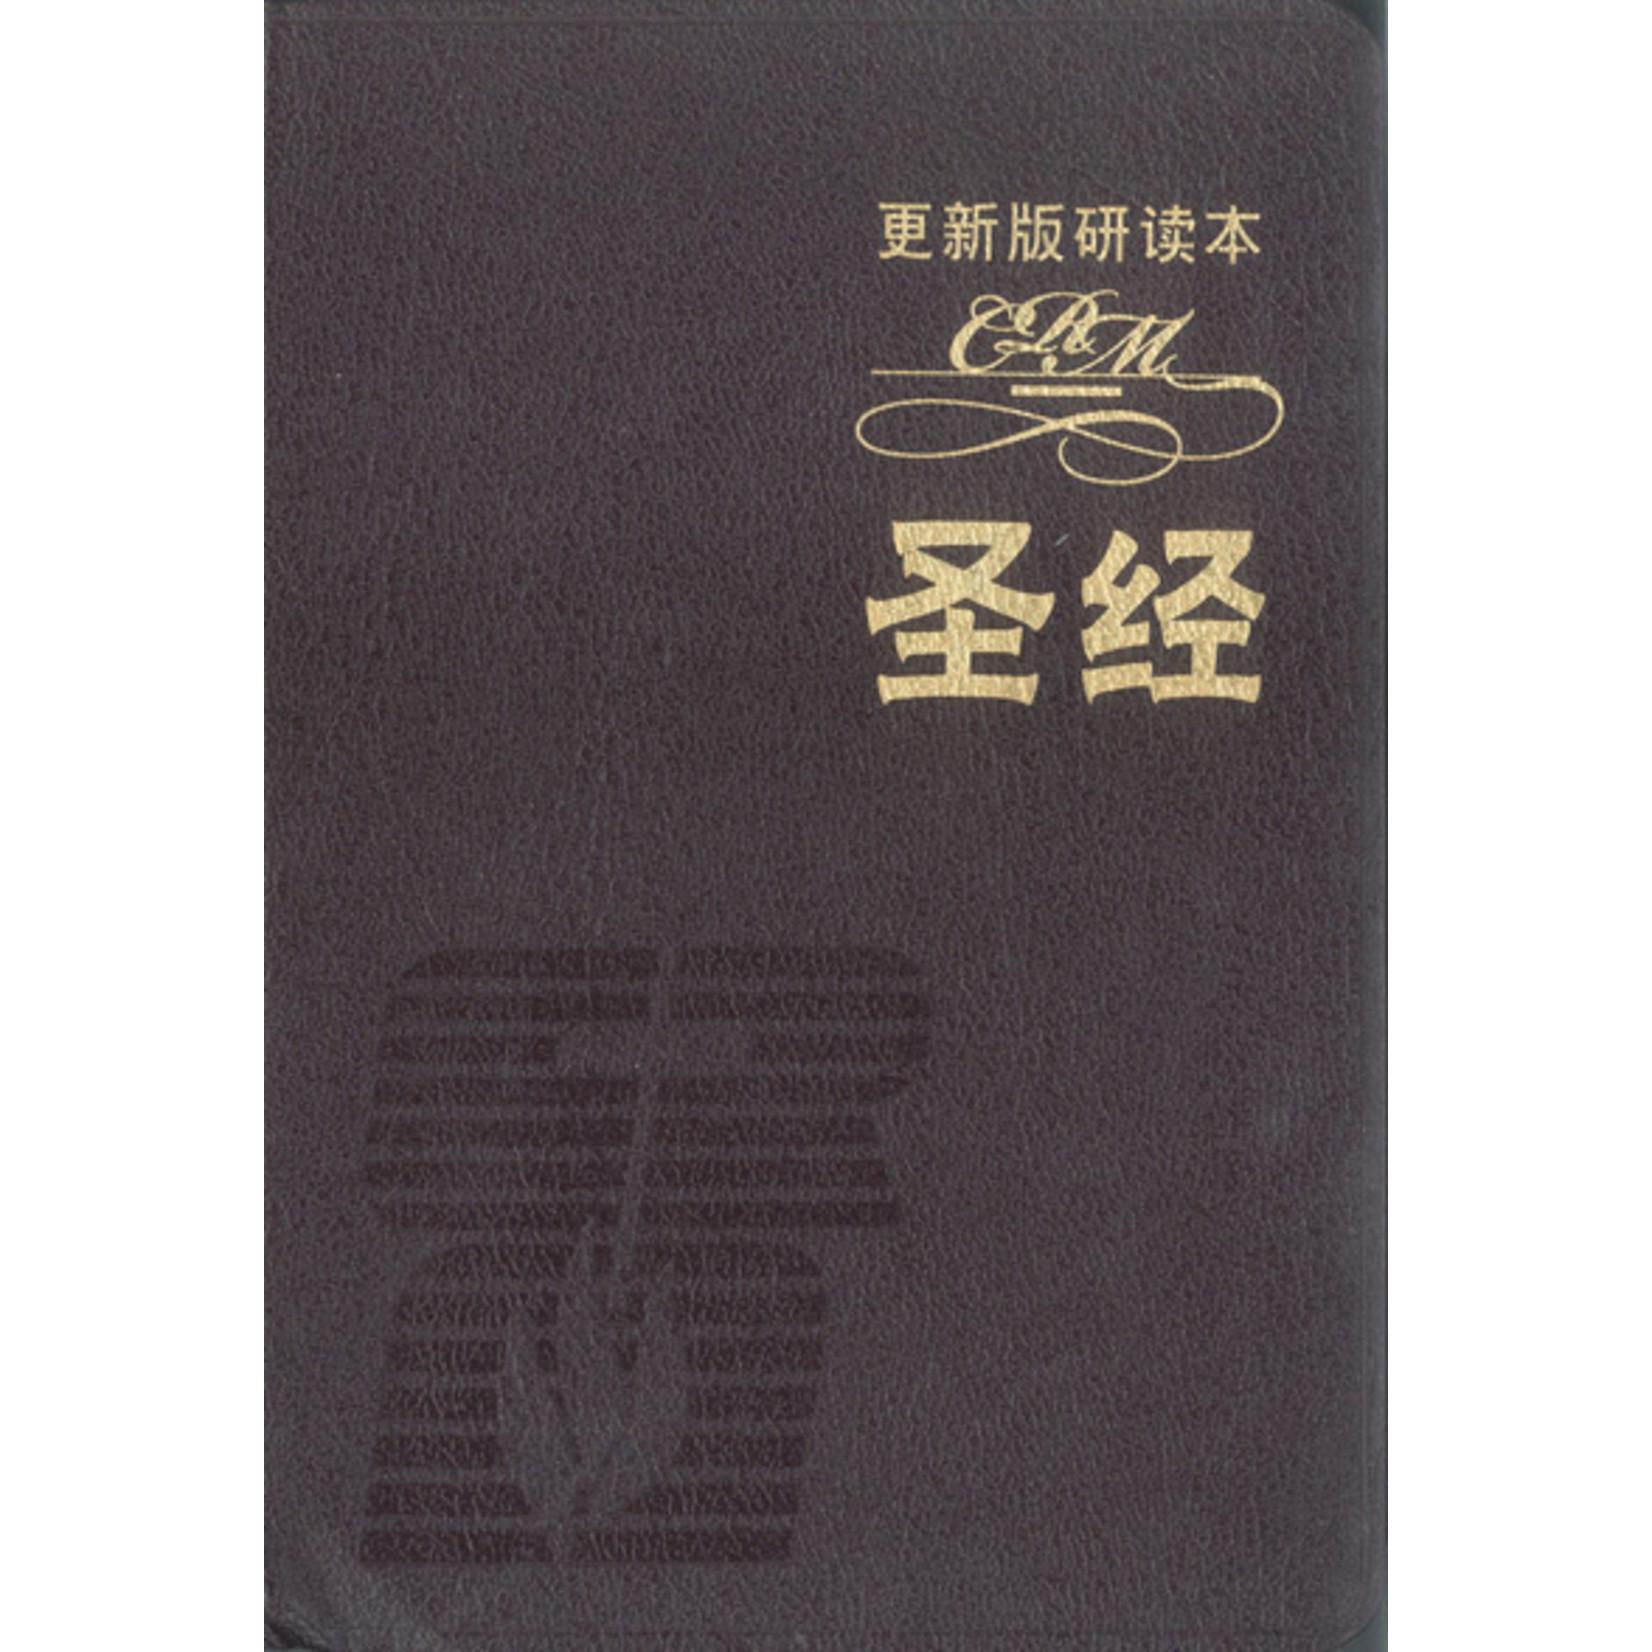 更新傳道會 Christian Renewal Ministries 更新版研讀本聖經.豪華本.紅色(簡體) CRM STUDY BIBLE(BURGUNDY/DELUXE)